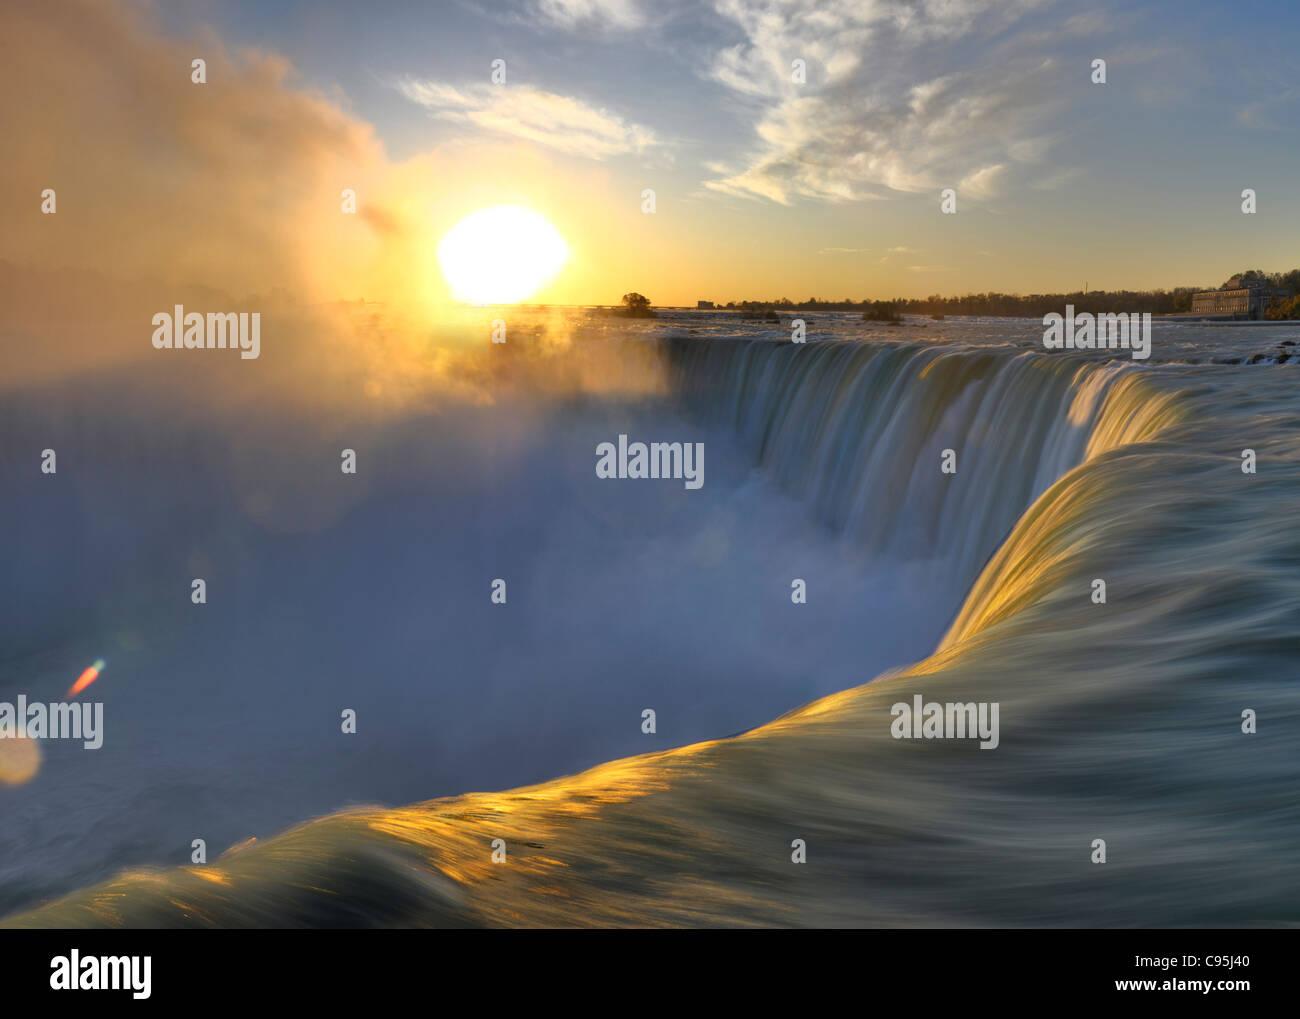 Brink of Niagara Falls Canadian Horseshoe during sunrise. Niagara Falls Ontario Canada. - Stock Image